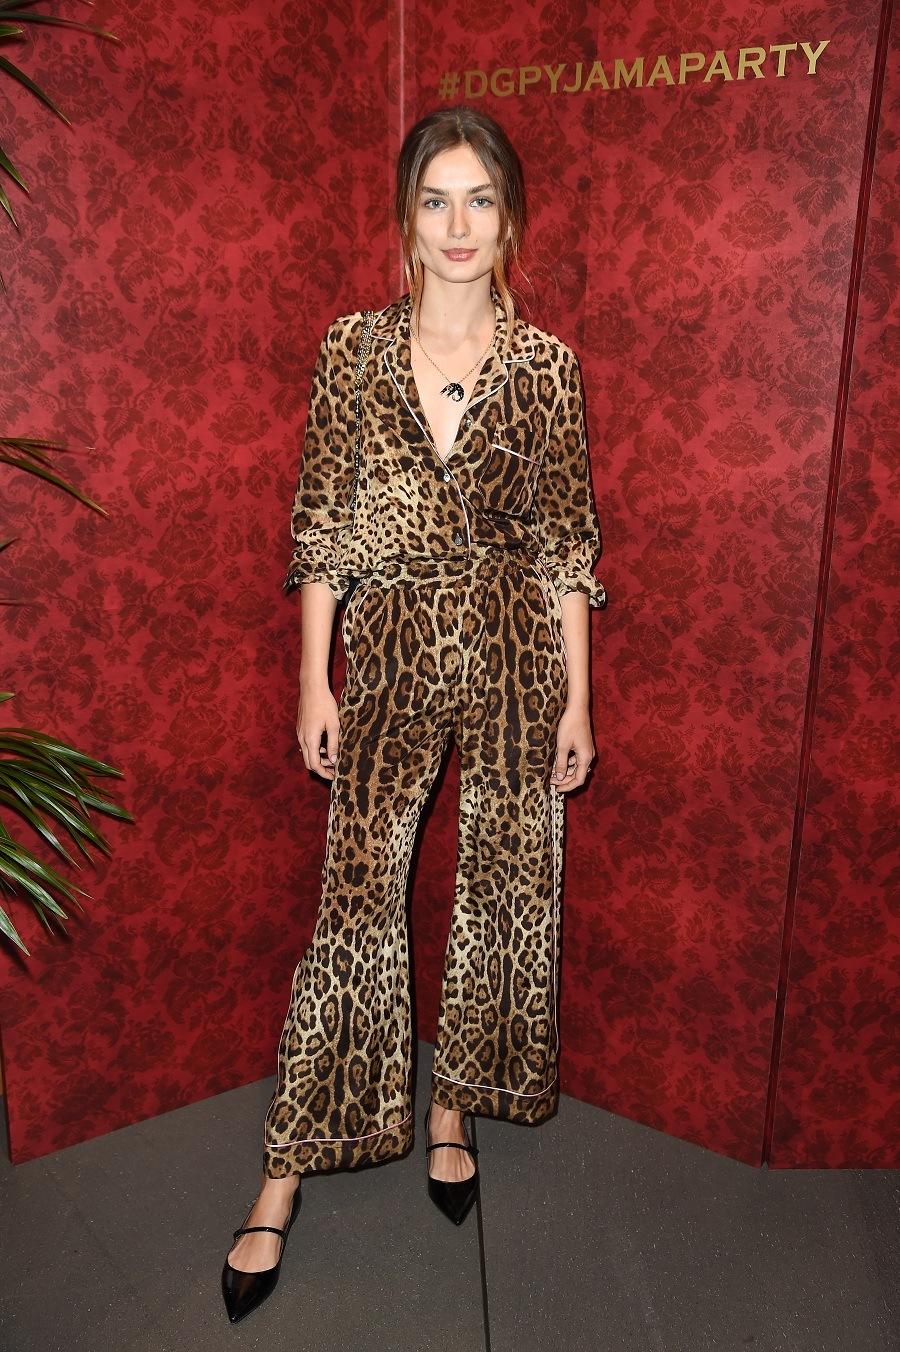 Model Andreea Diaconu attends the Dolce & Gabbana pyjama party